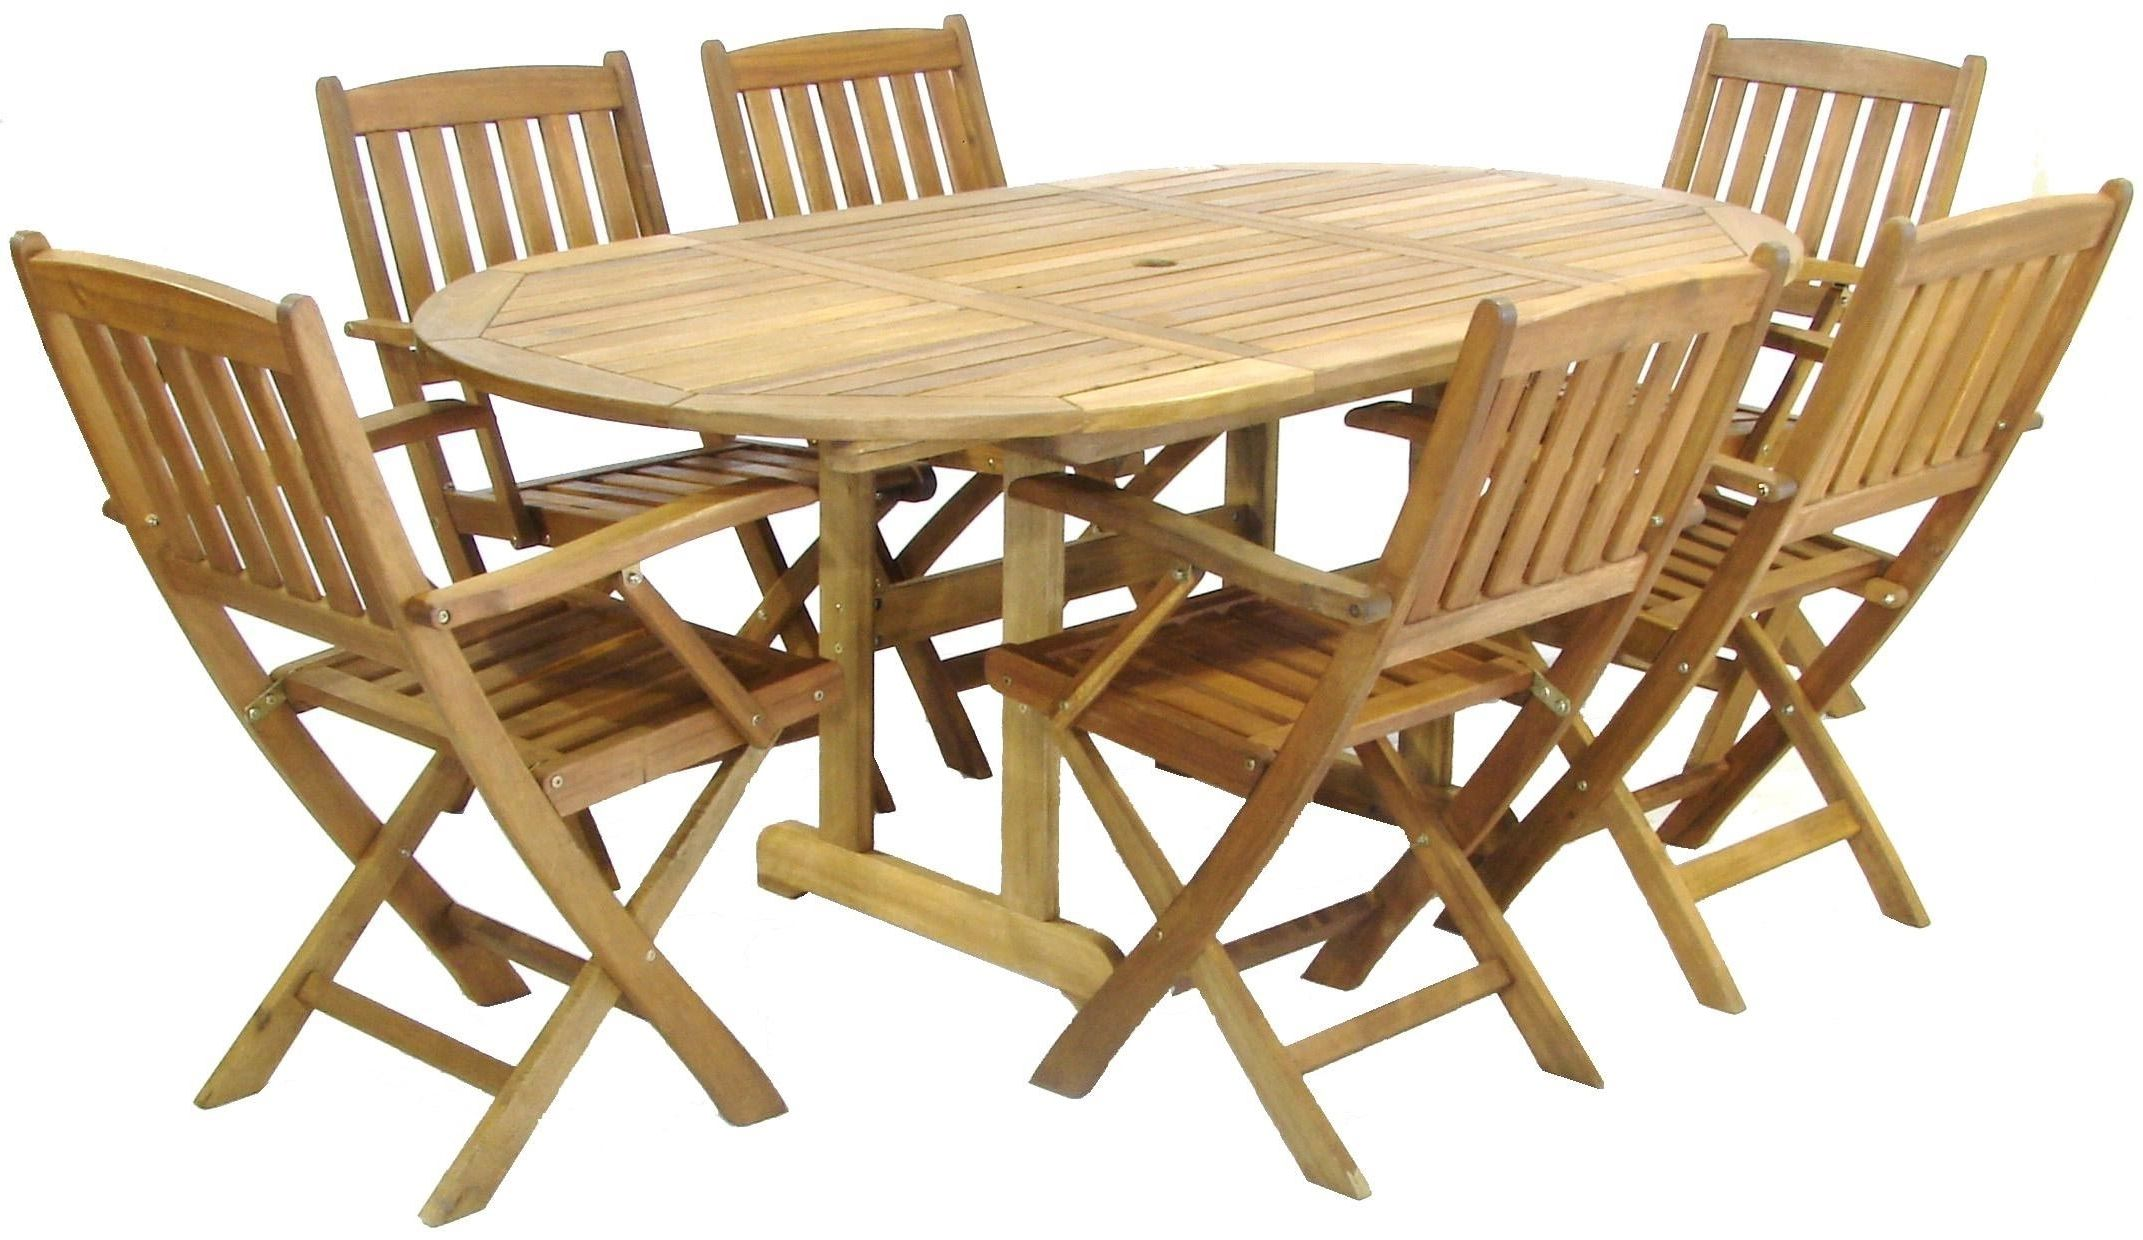 Folding Dining Chairs Asda